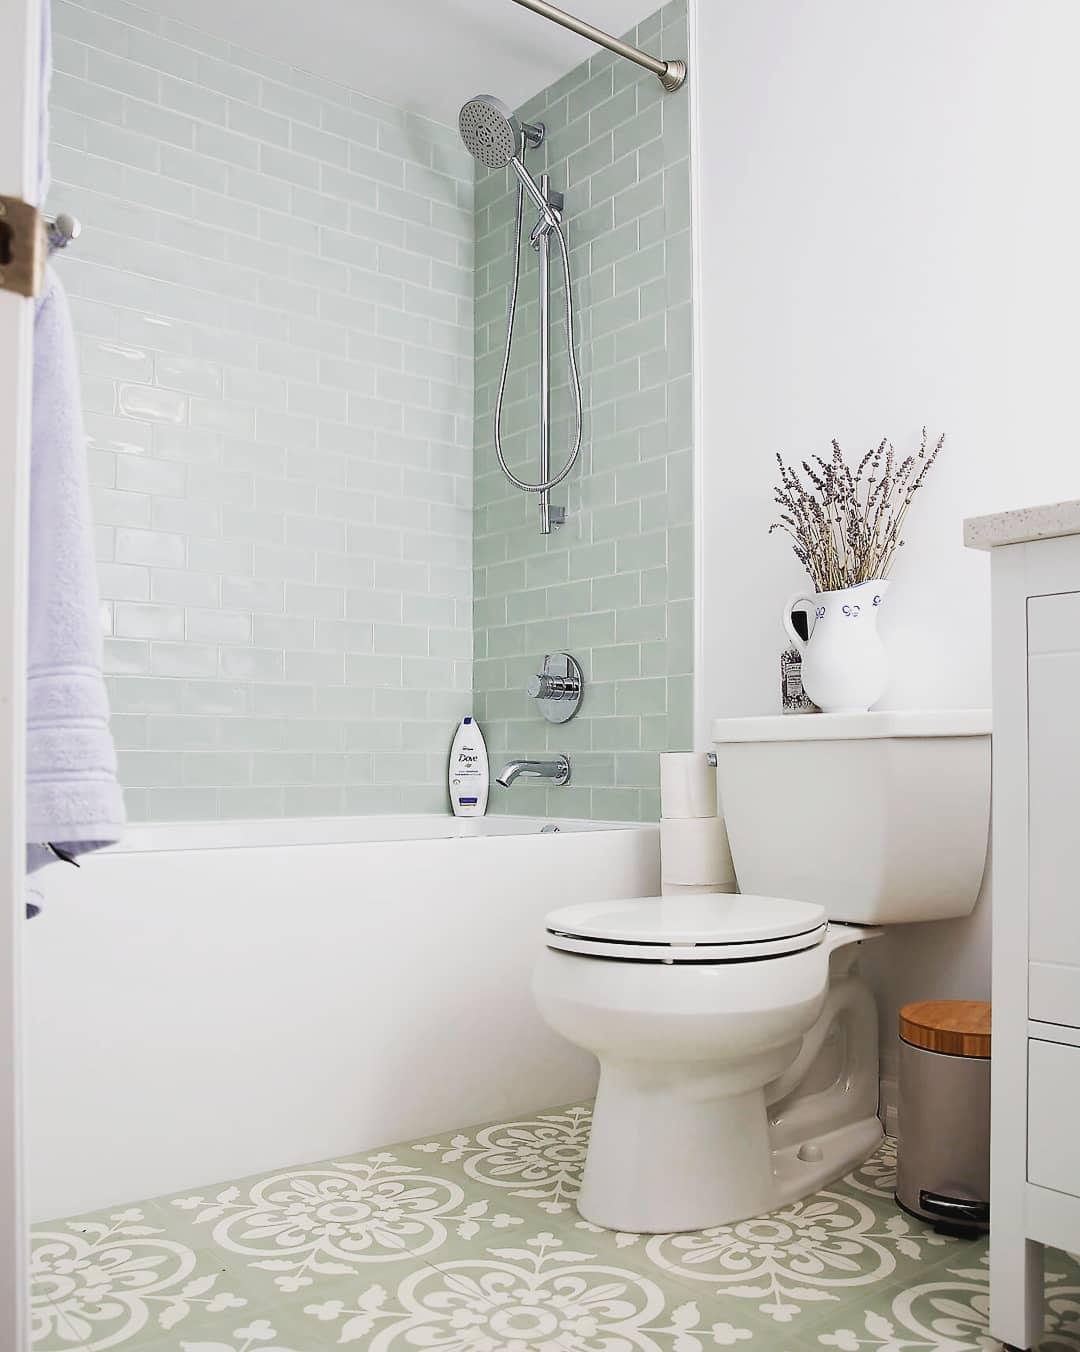 Bathtub for HDBs Singapore - Built-in bathtub